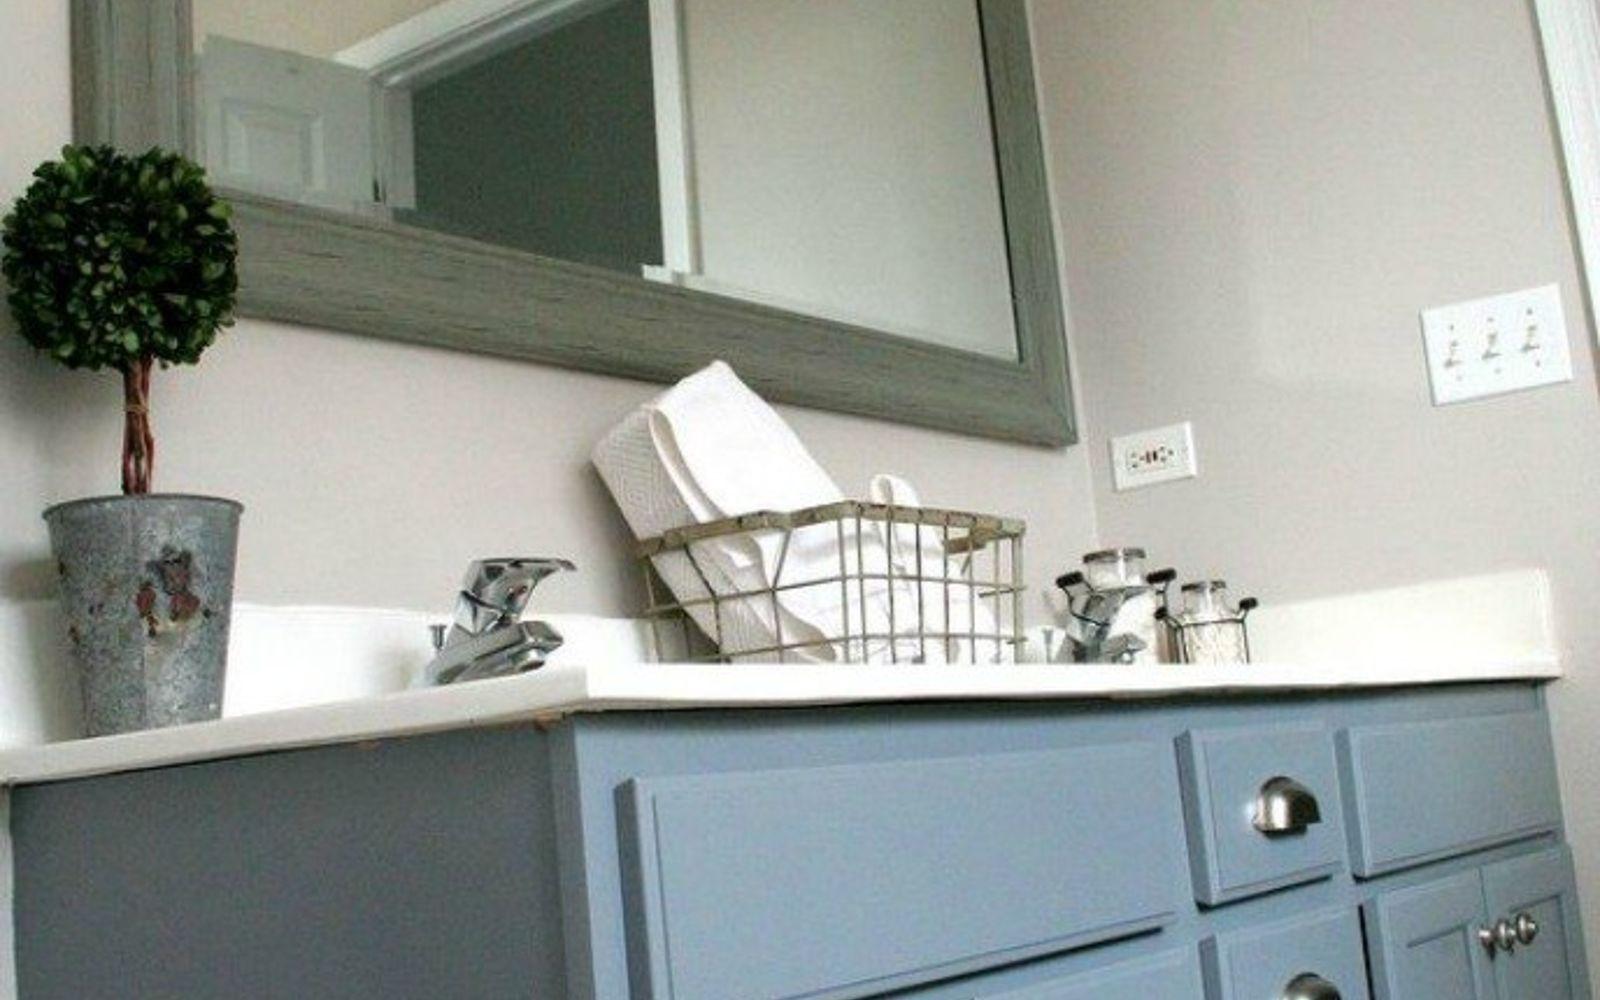 Bathroom Vanity Paint Ideas 11 ways to transform your bathroom vanity without replacing it